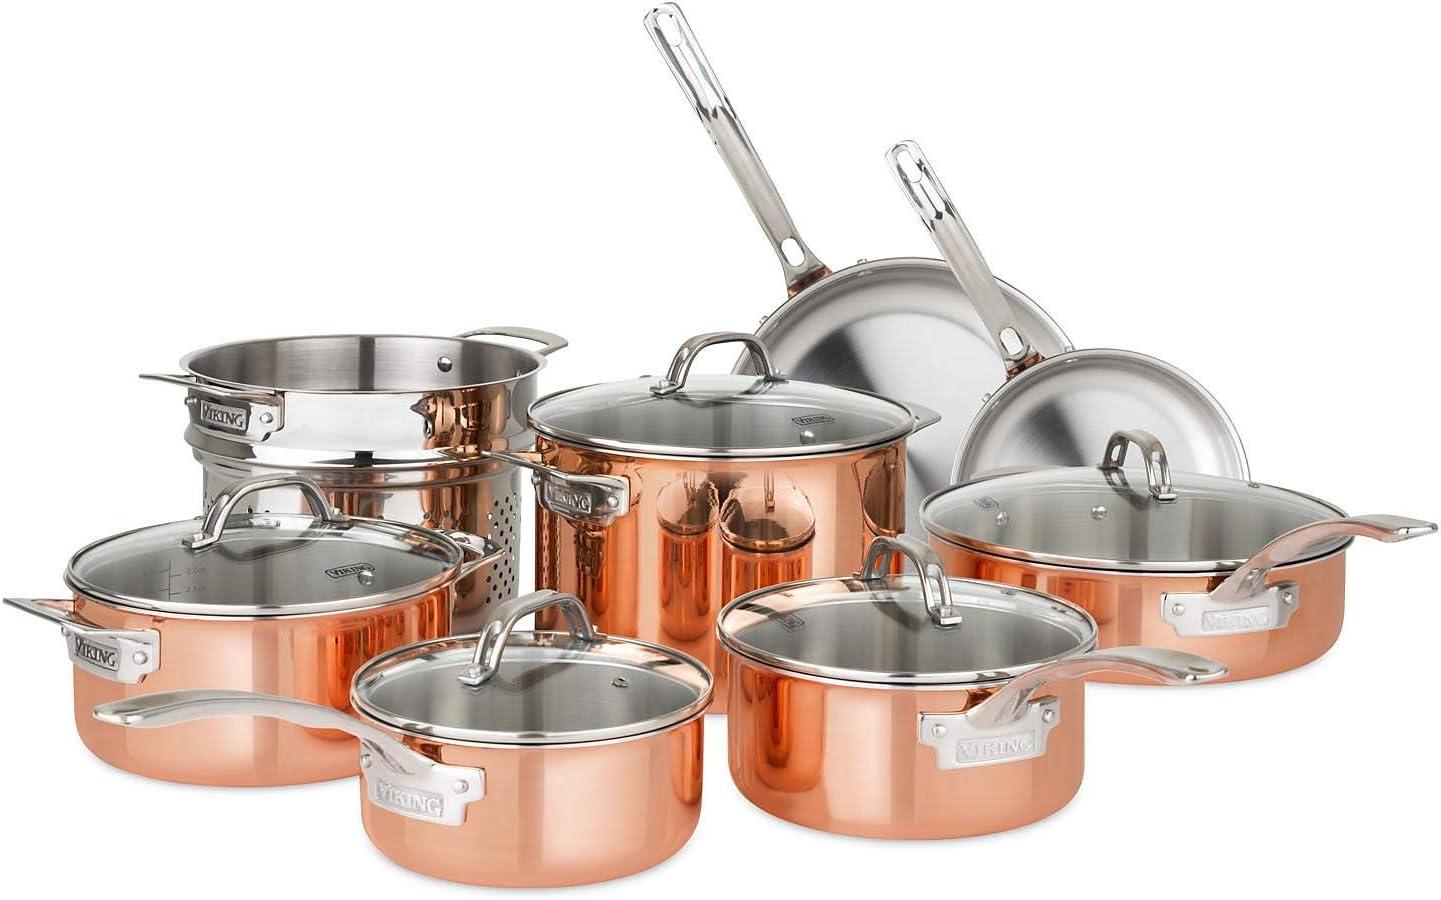 13-Piece Viking Tri-Ply Copper Cookware